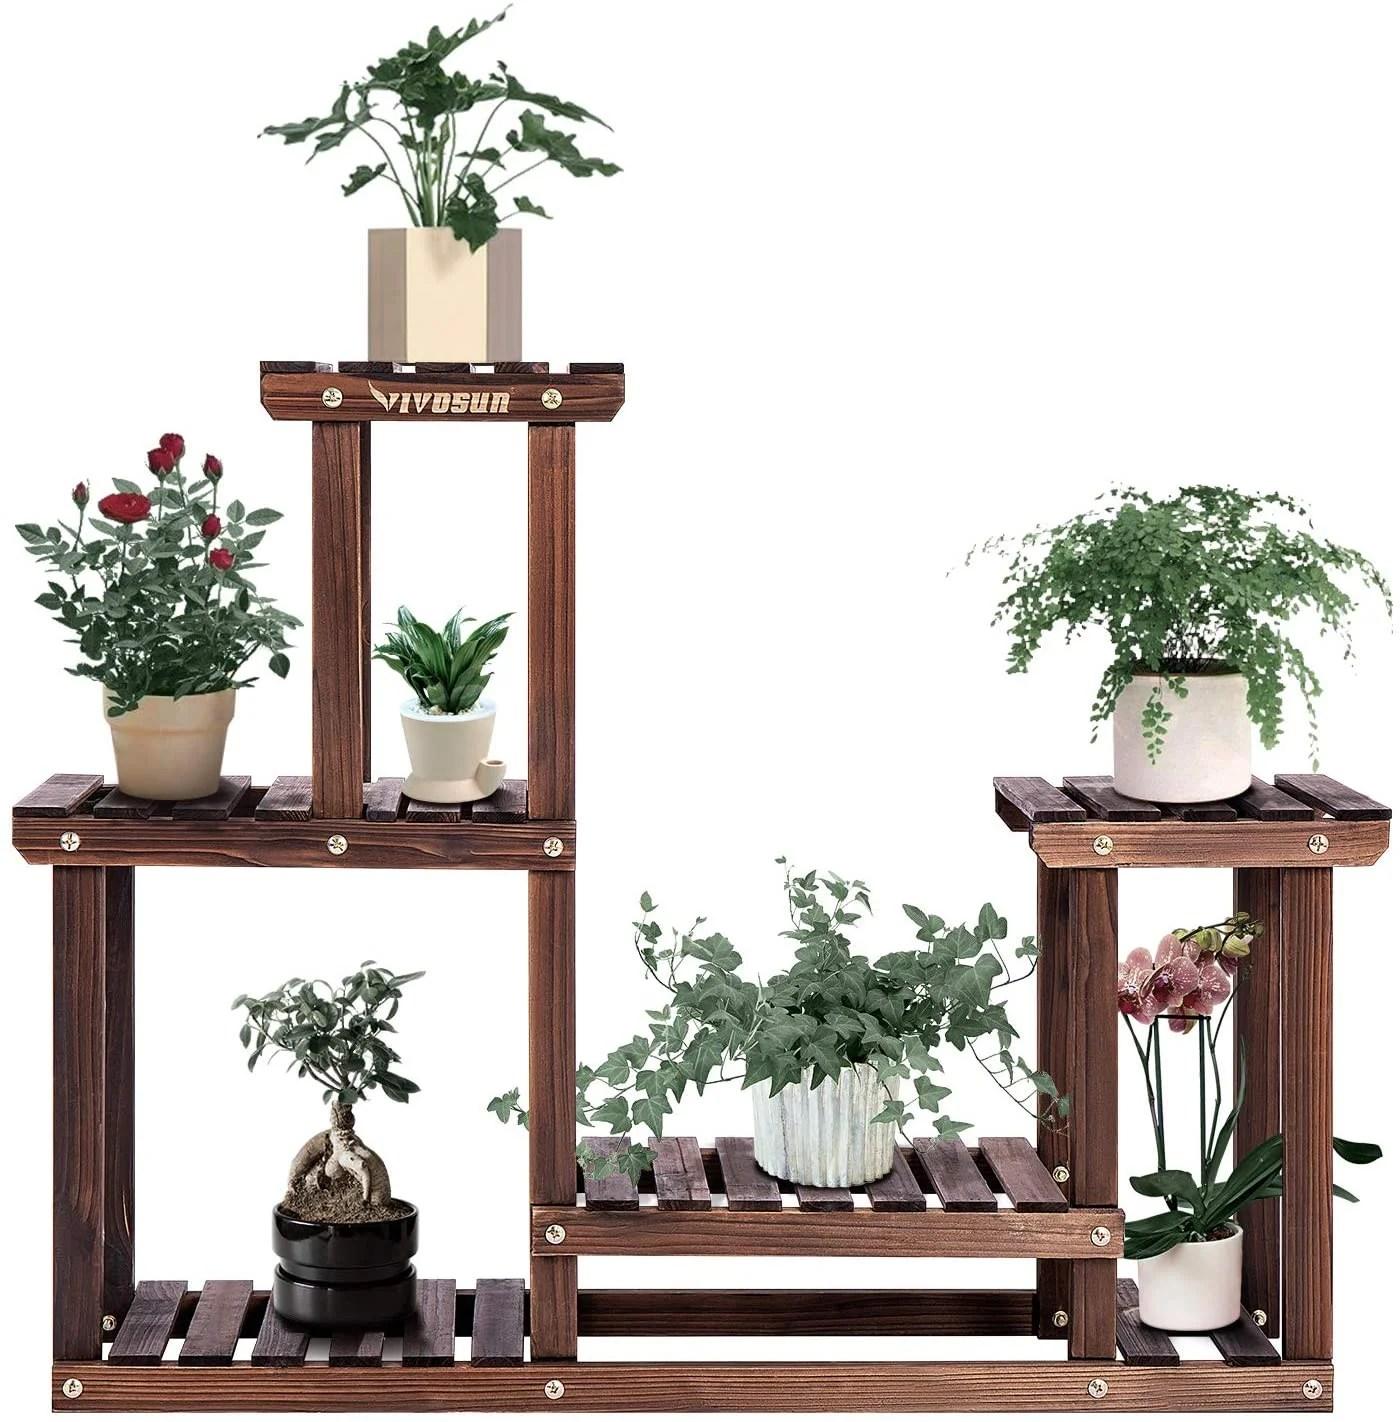 vivosun 3 tier wood plant stand high low shelves flower rack display for indoor outdoor garden lawn patio bathroom office living room balcony